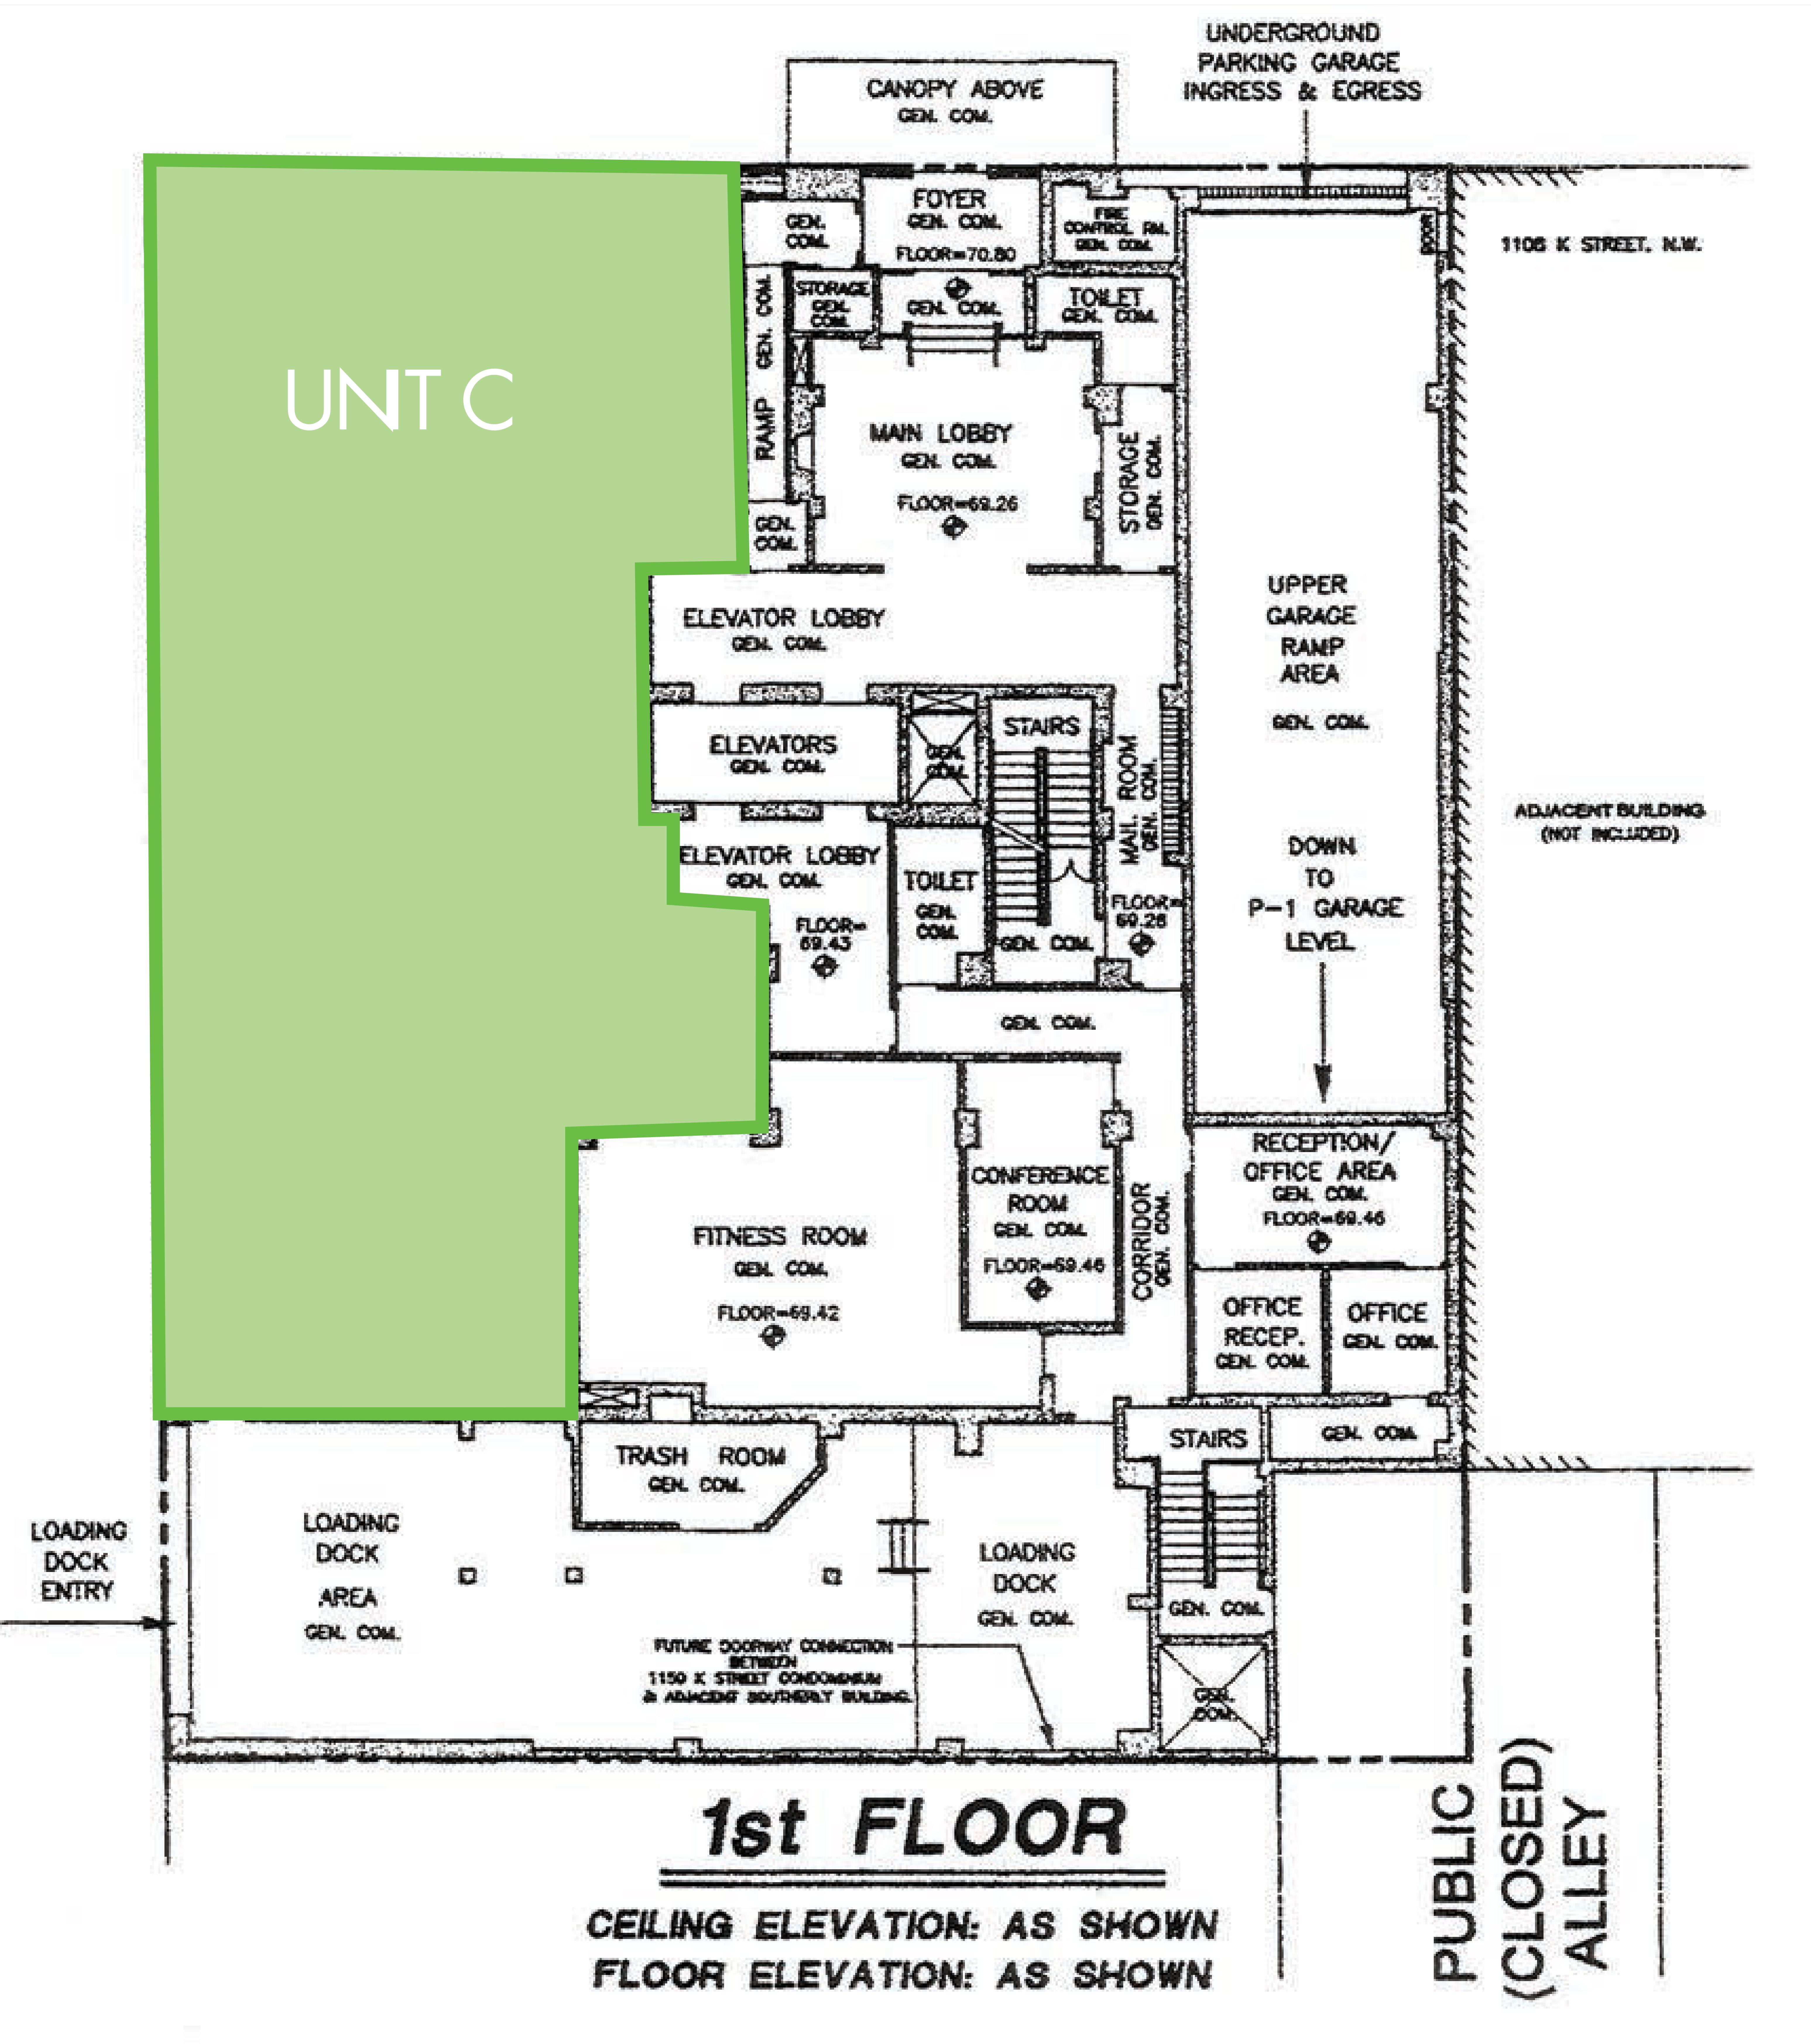 1150 K Street NW: site plan